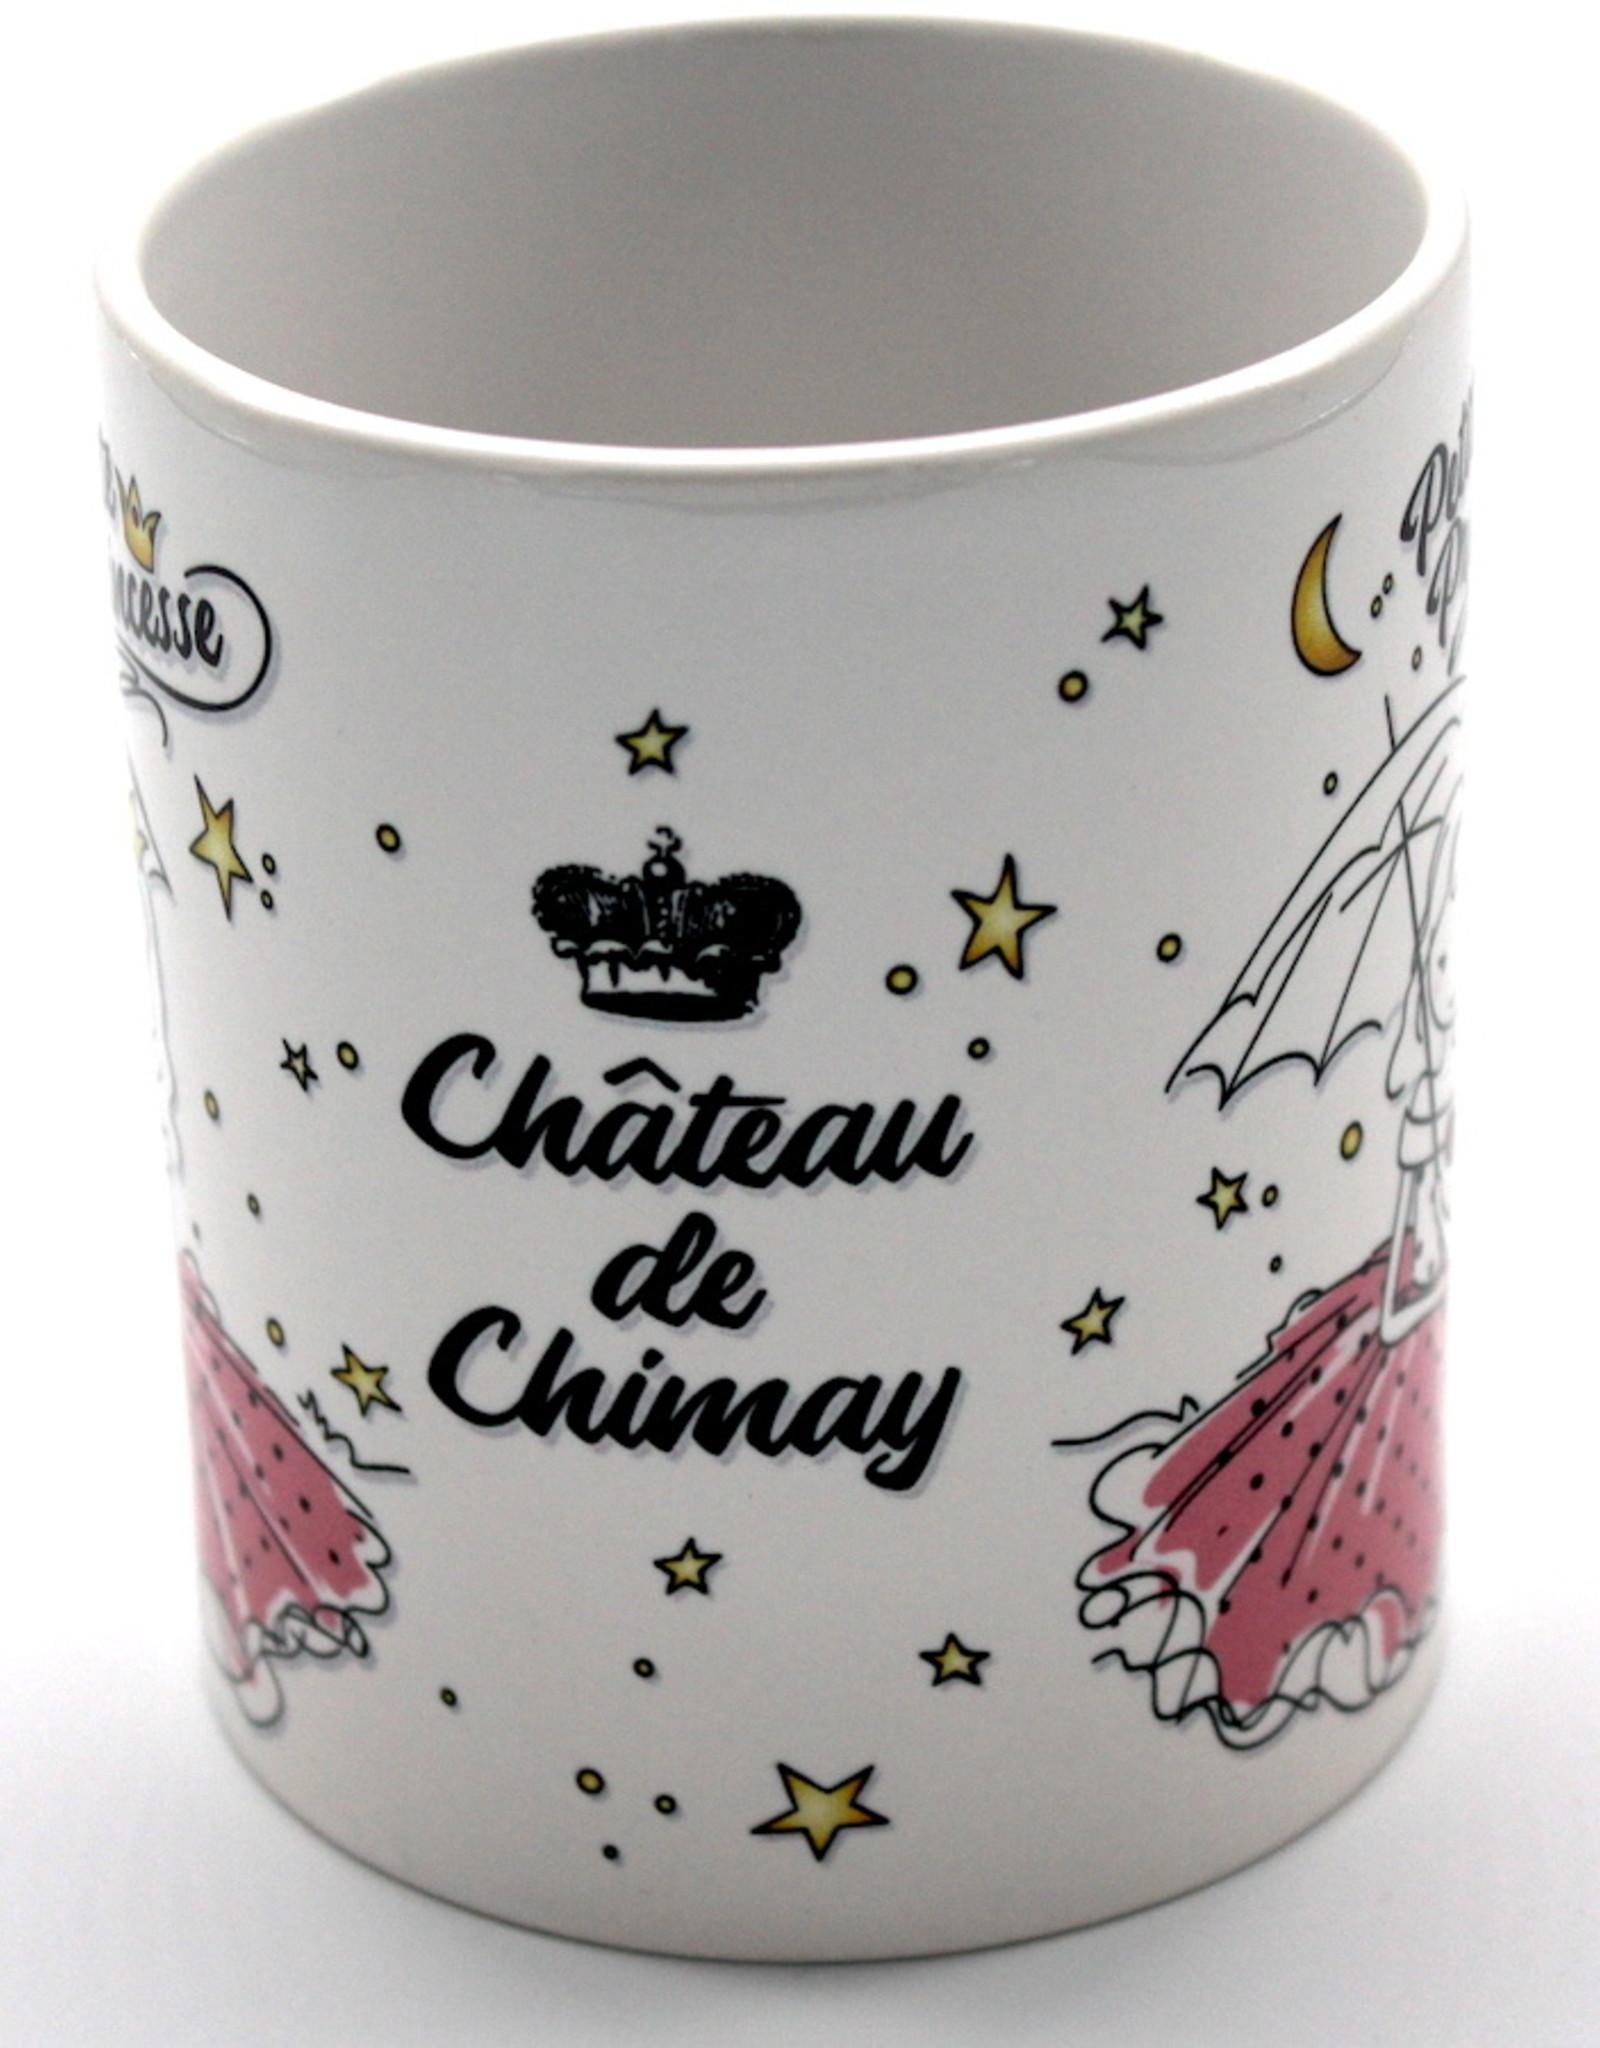 Château de Chimay Mug Petite Princesse Chateau de Chimay